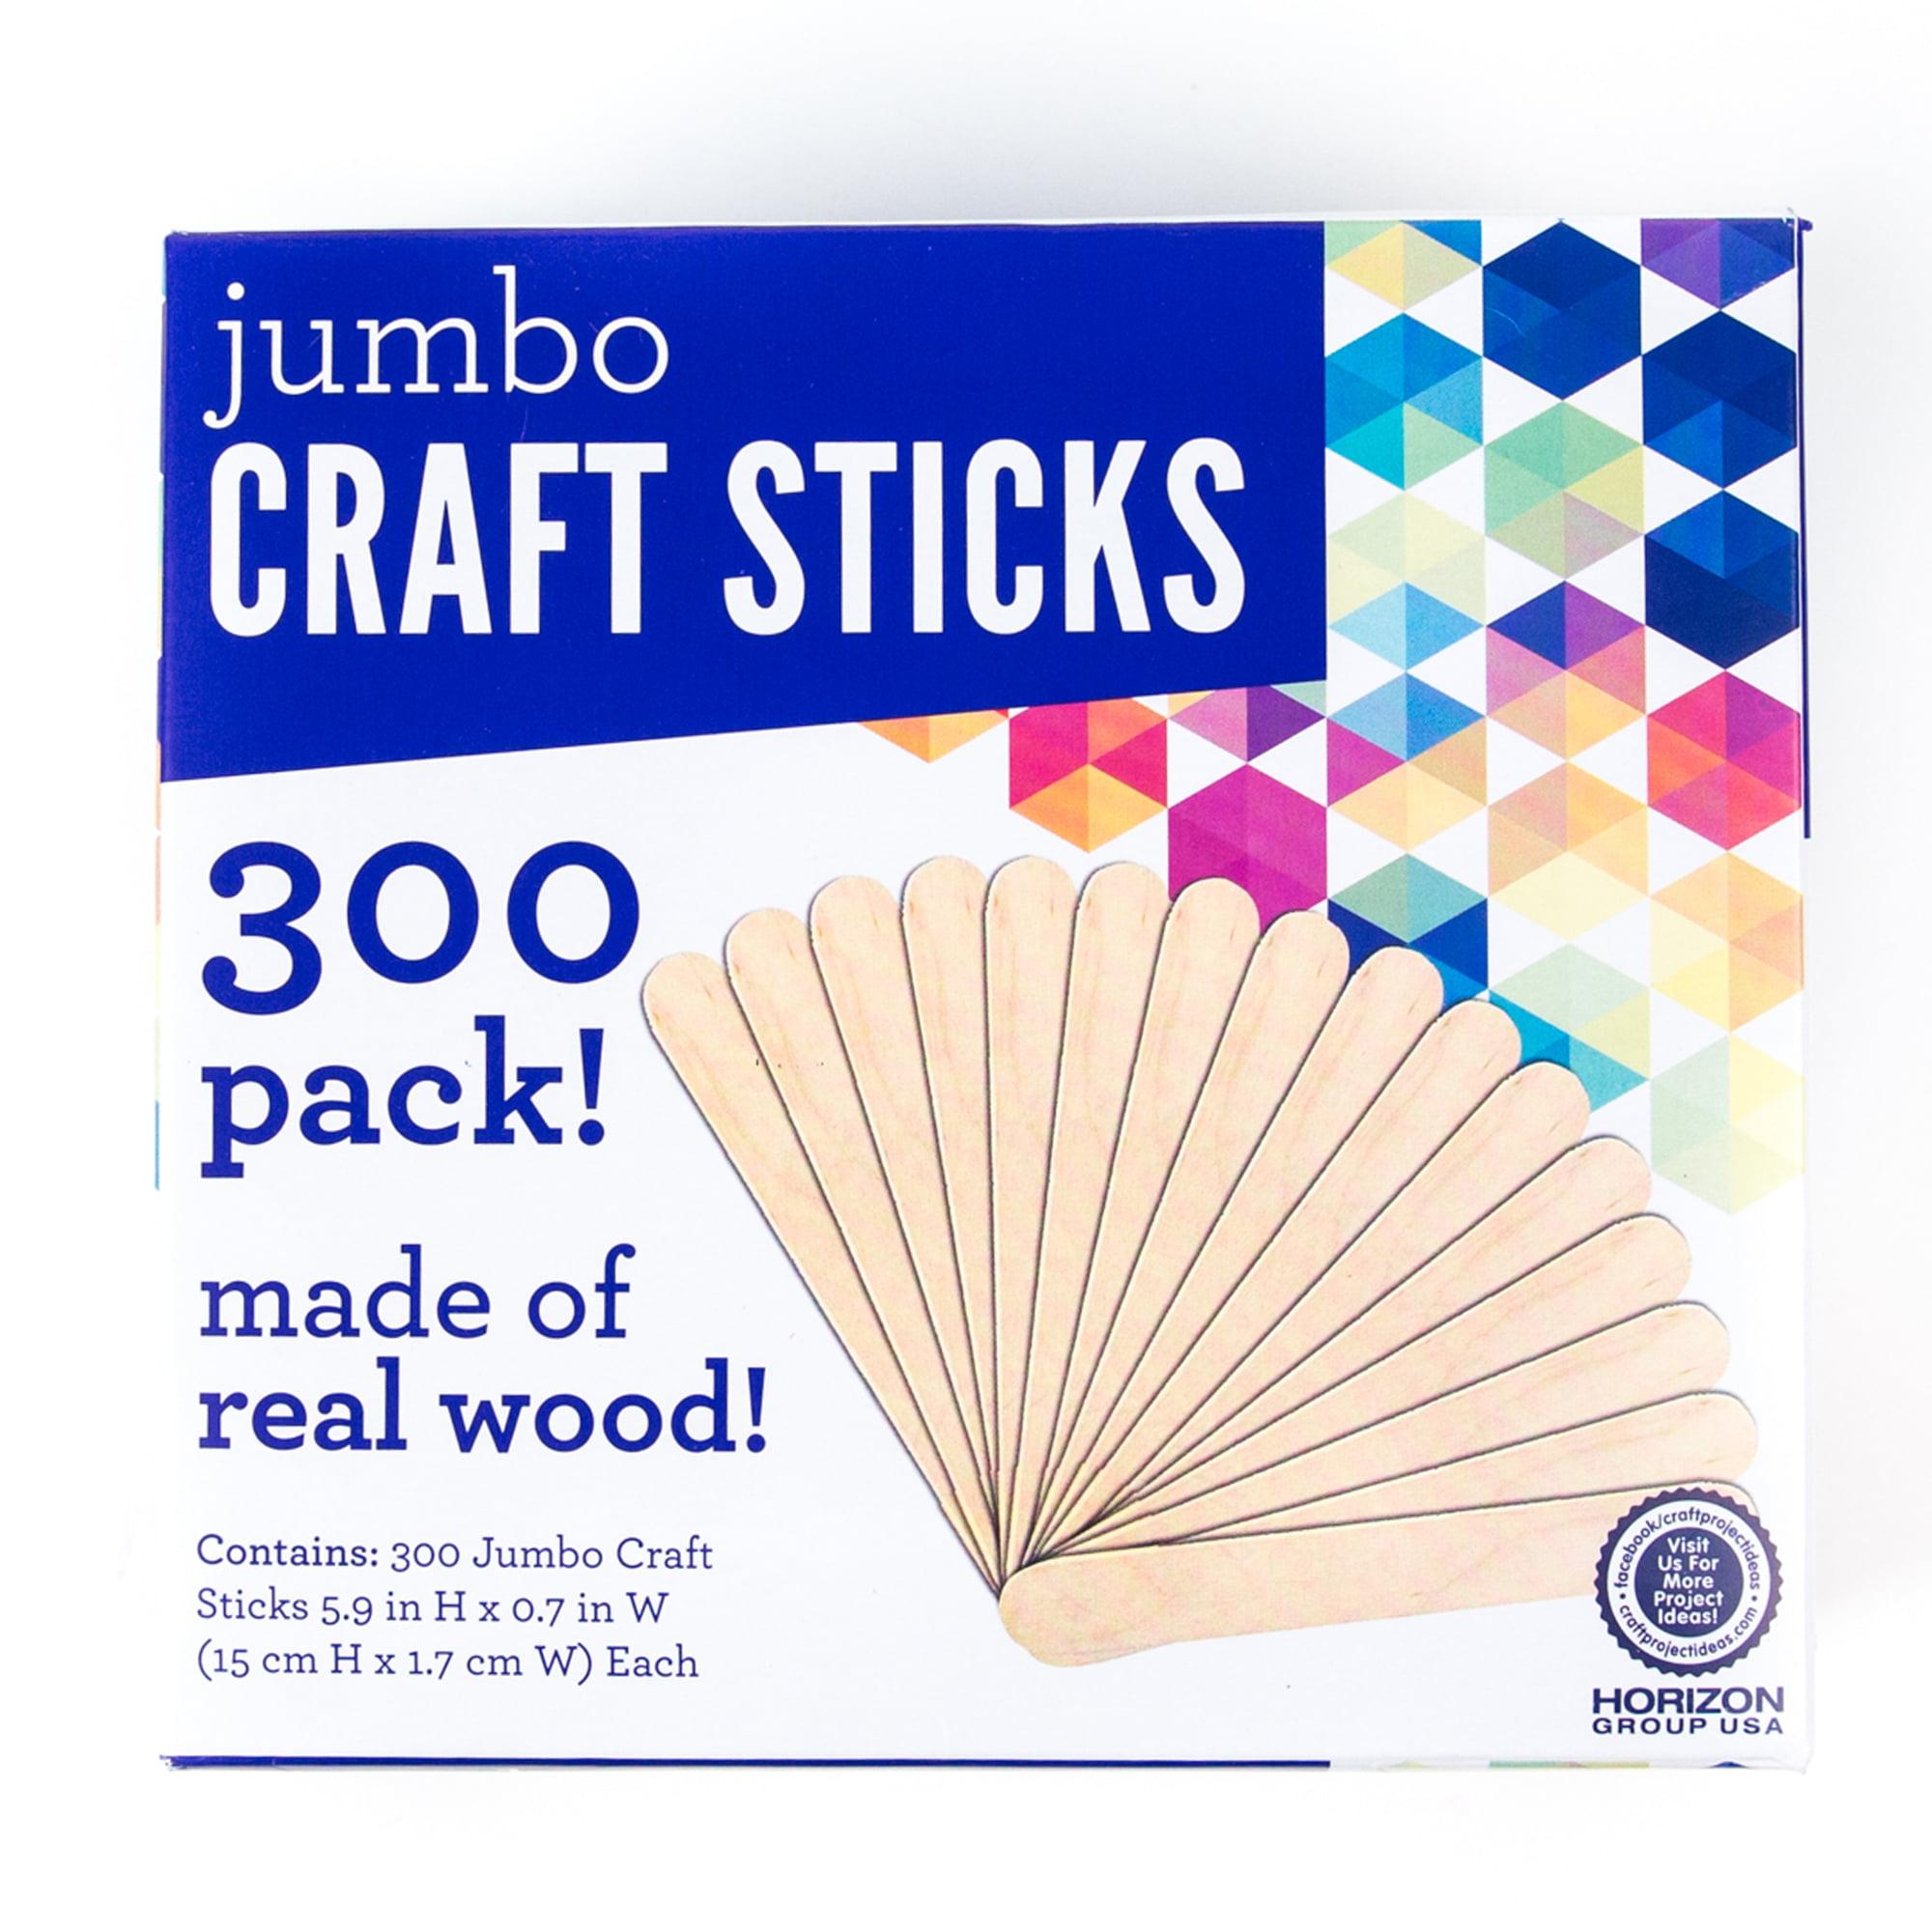 Jumbo Craft Sticks 300pk By Horizon Group USA